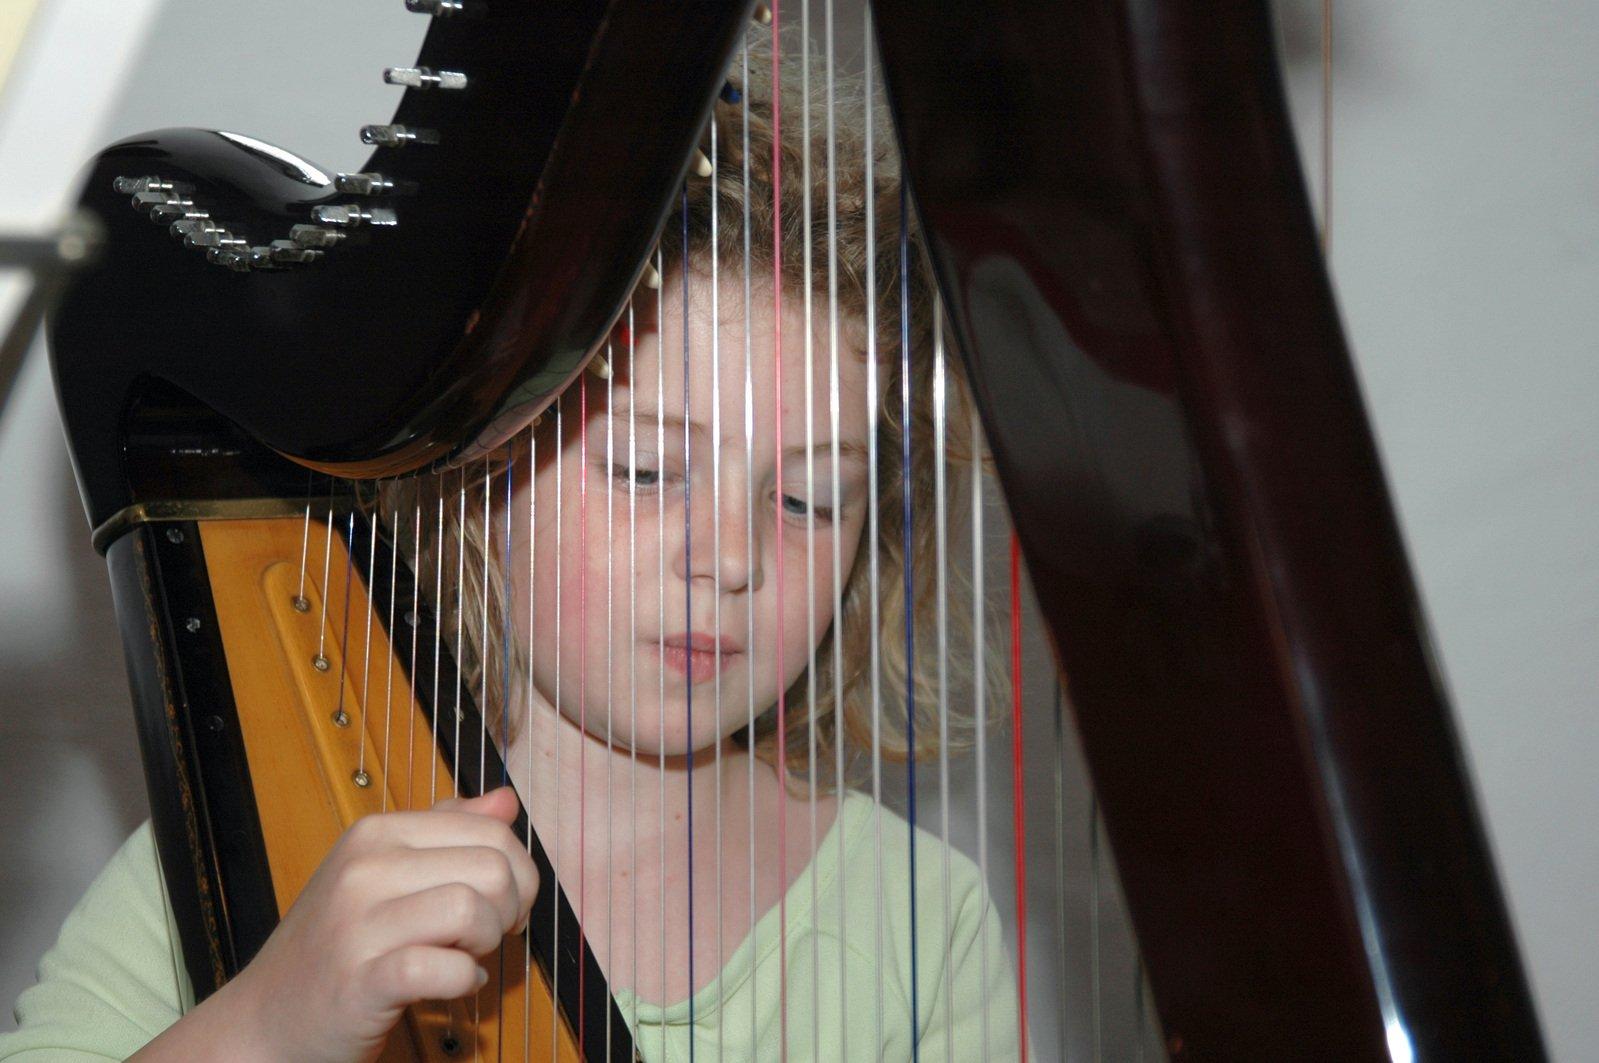 Little child playing Harp